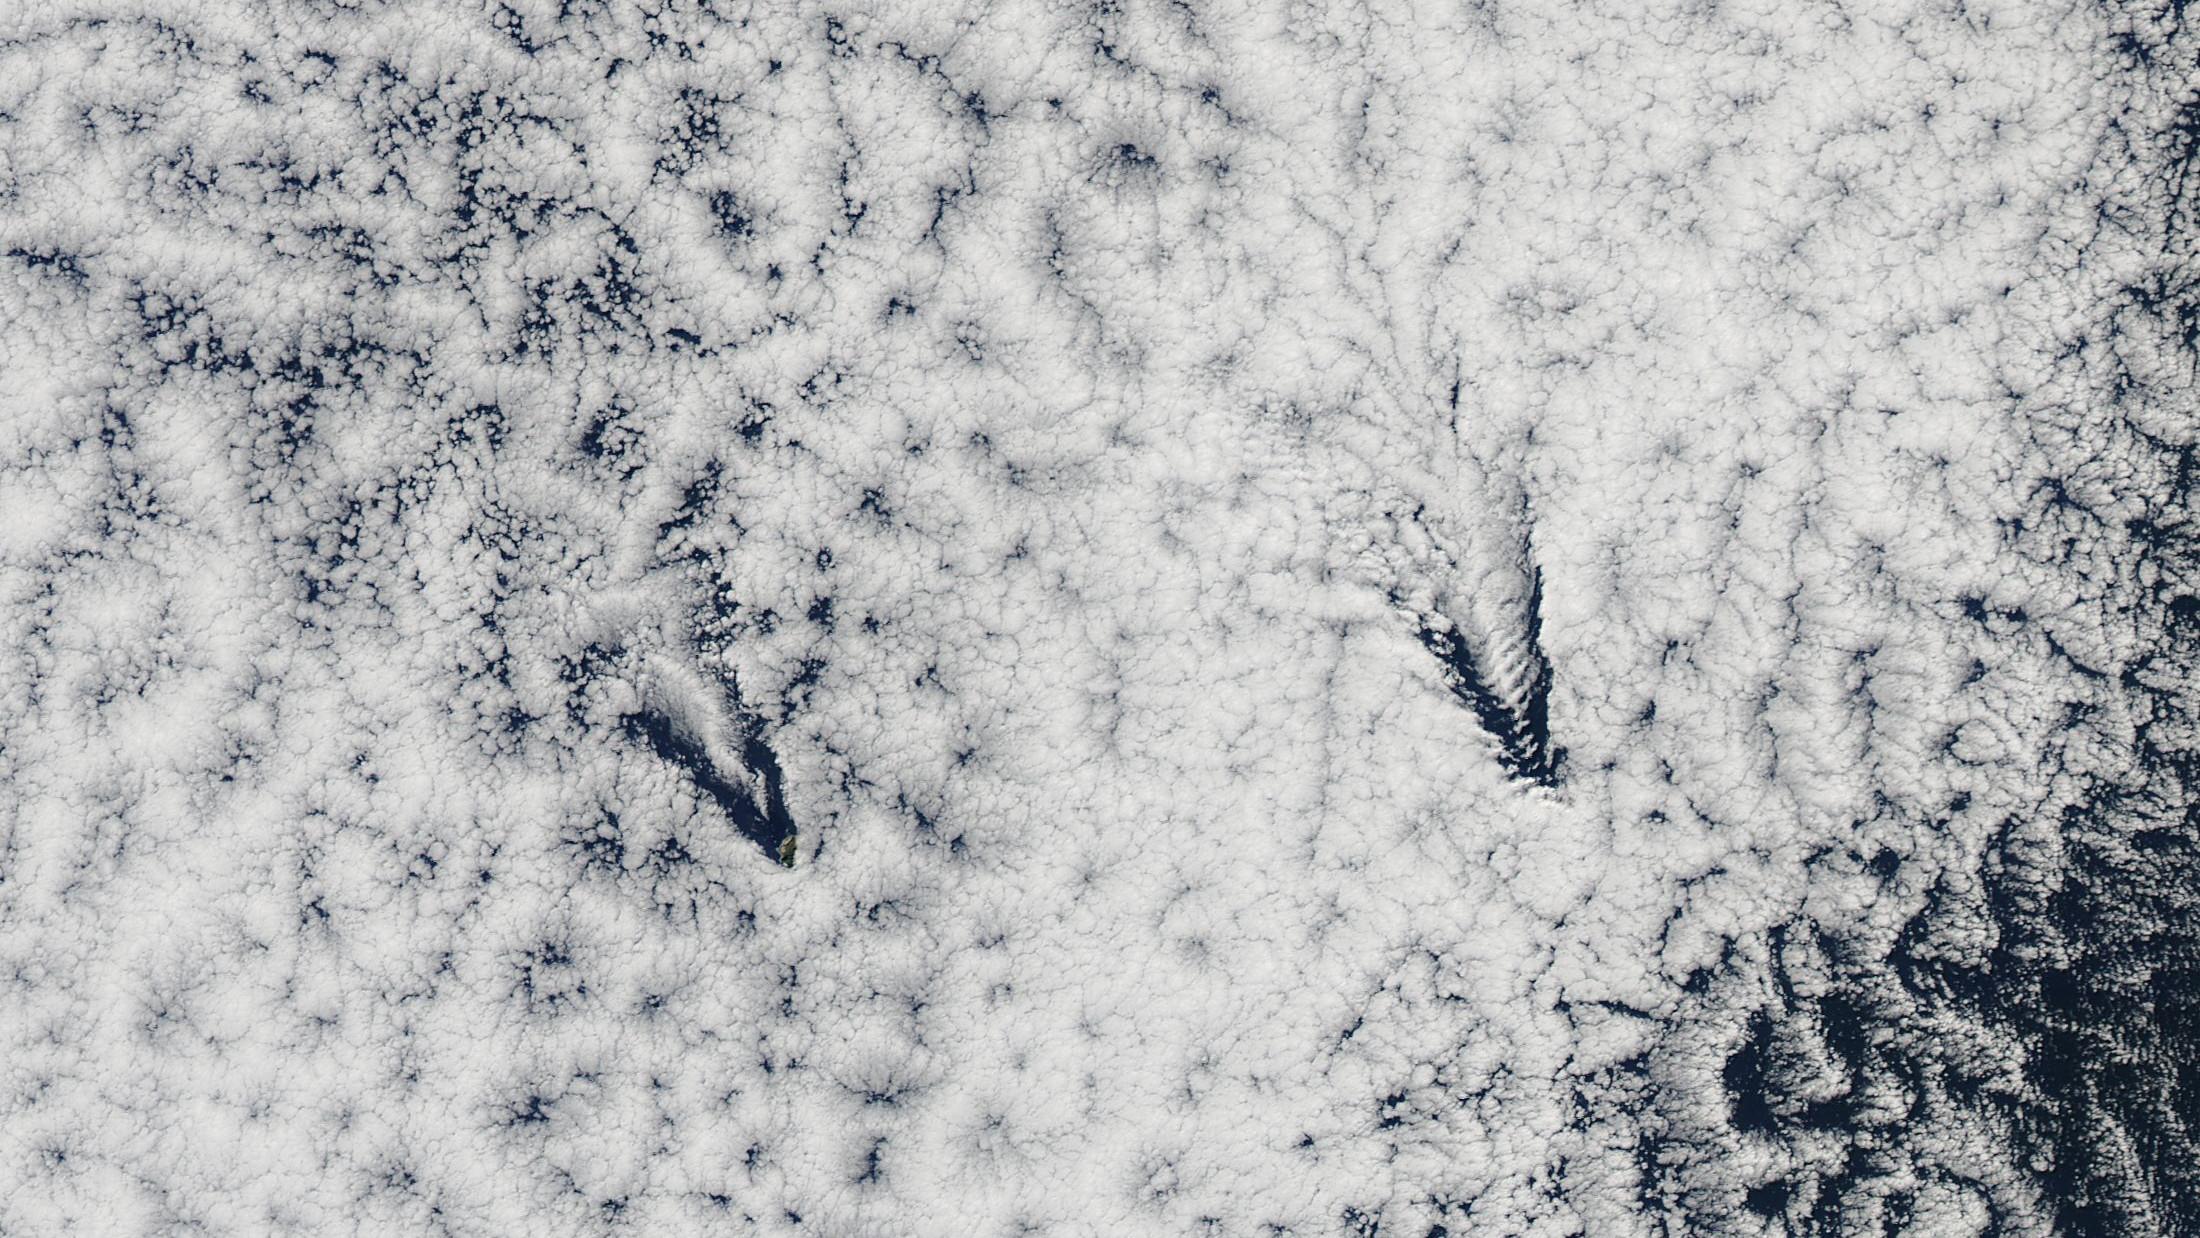 A view of the Juan Fernandez Islands cutting through the clouds, taken  700 km up.